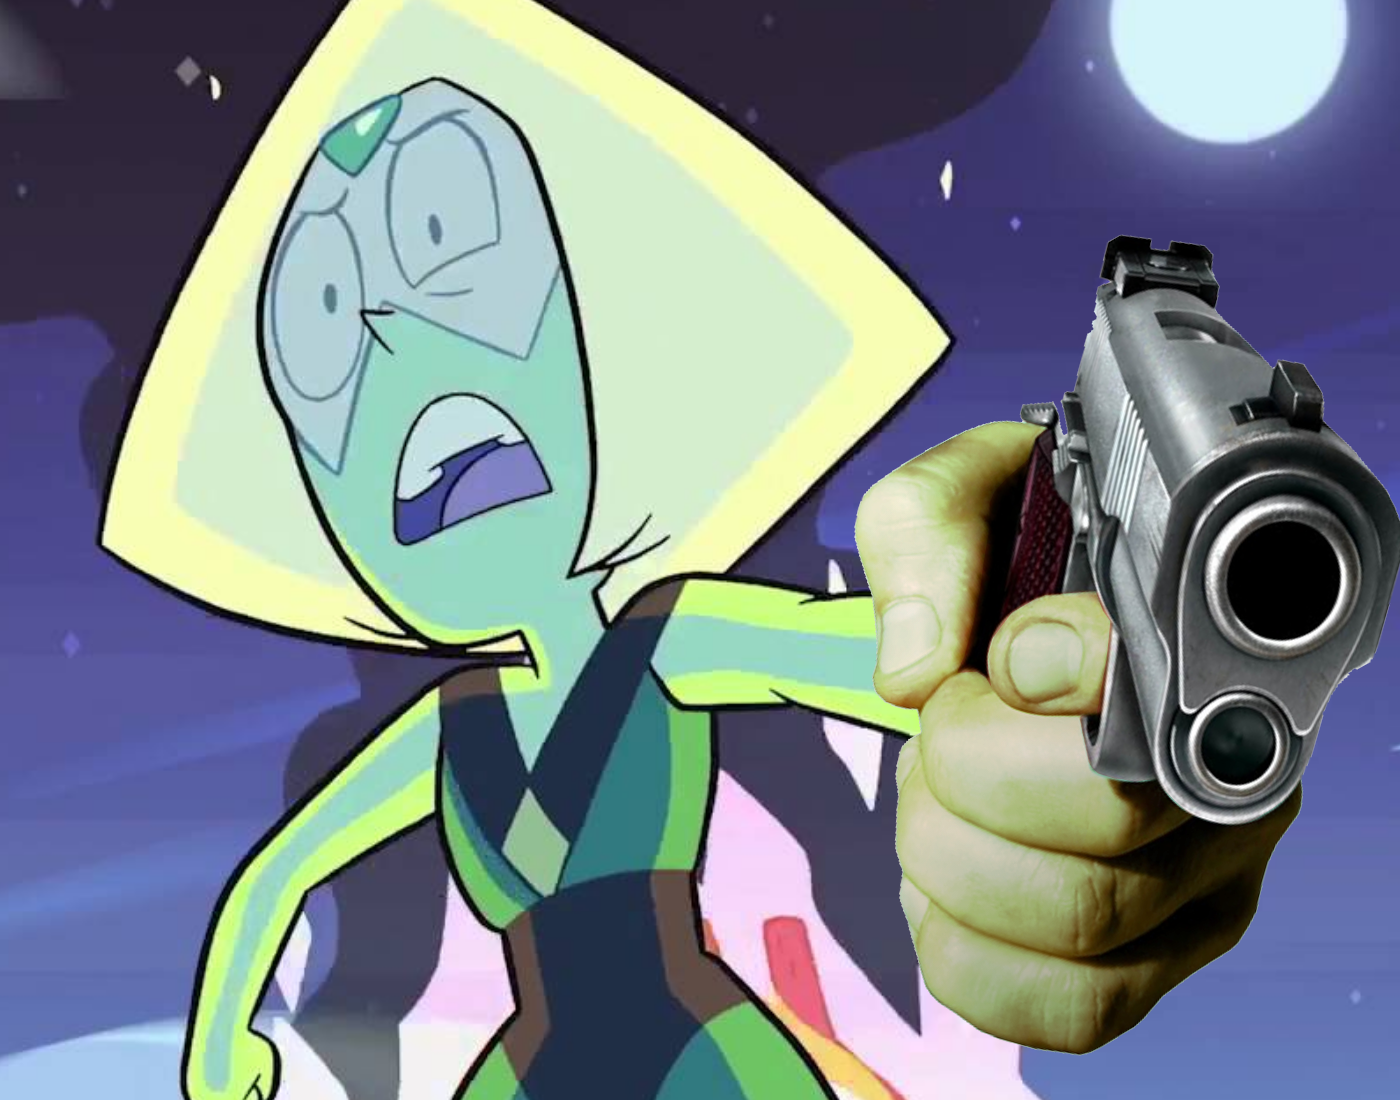 Doge Pointing Gun Meme - CALCRO